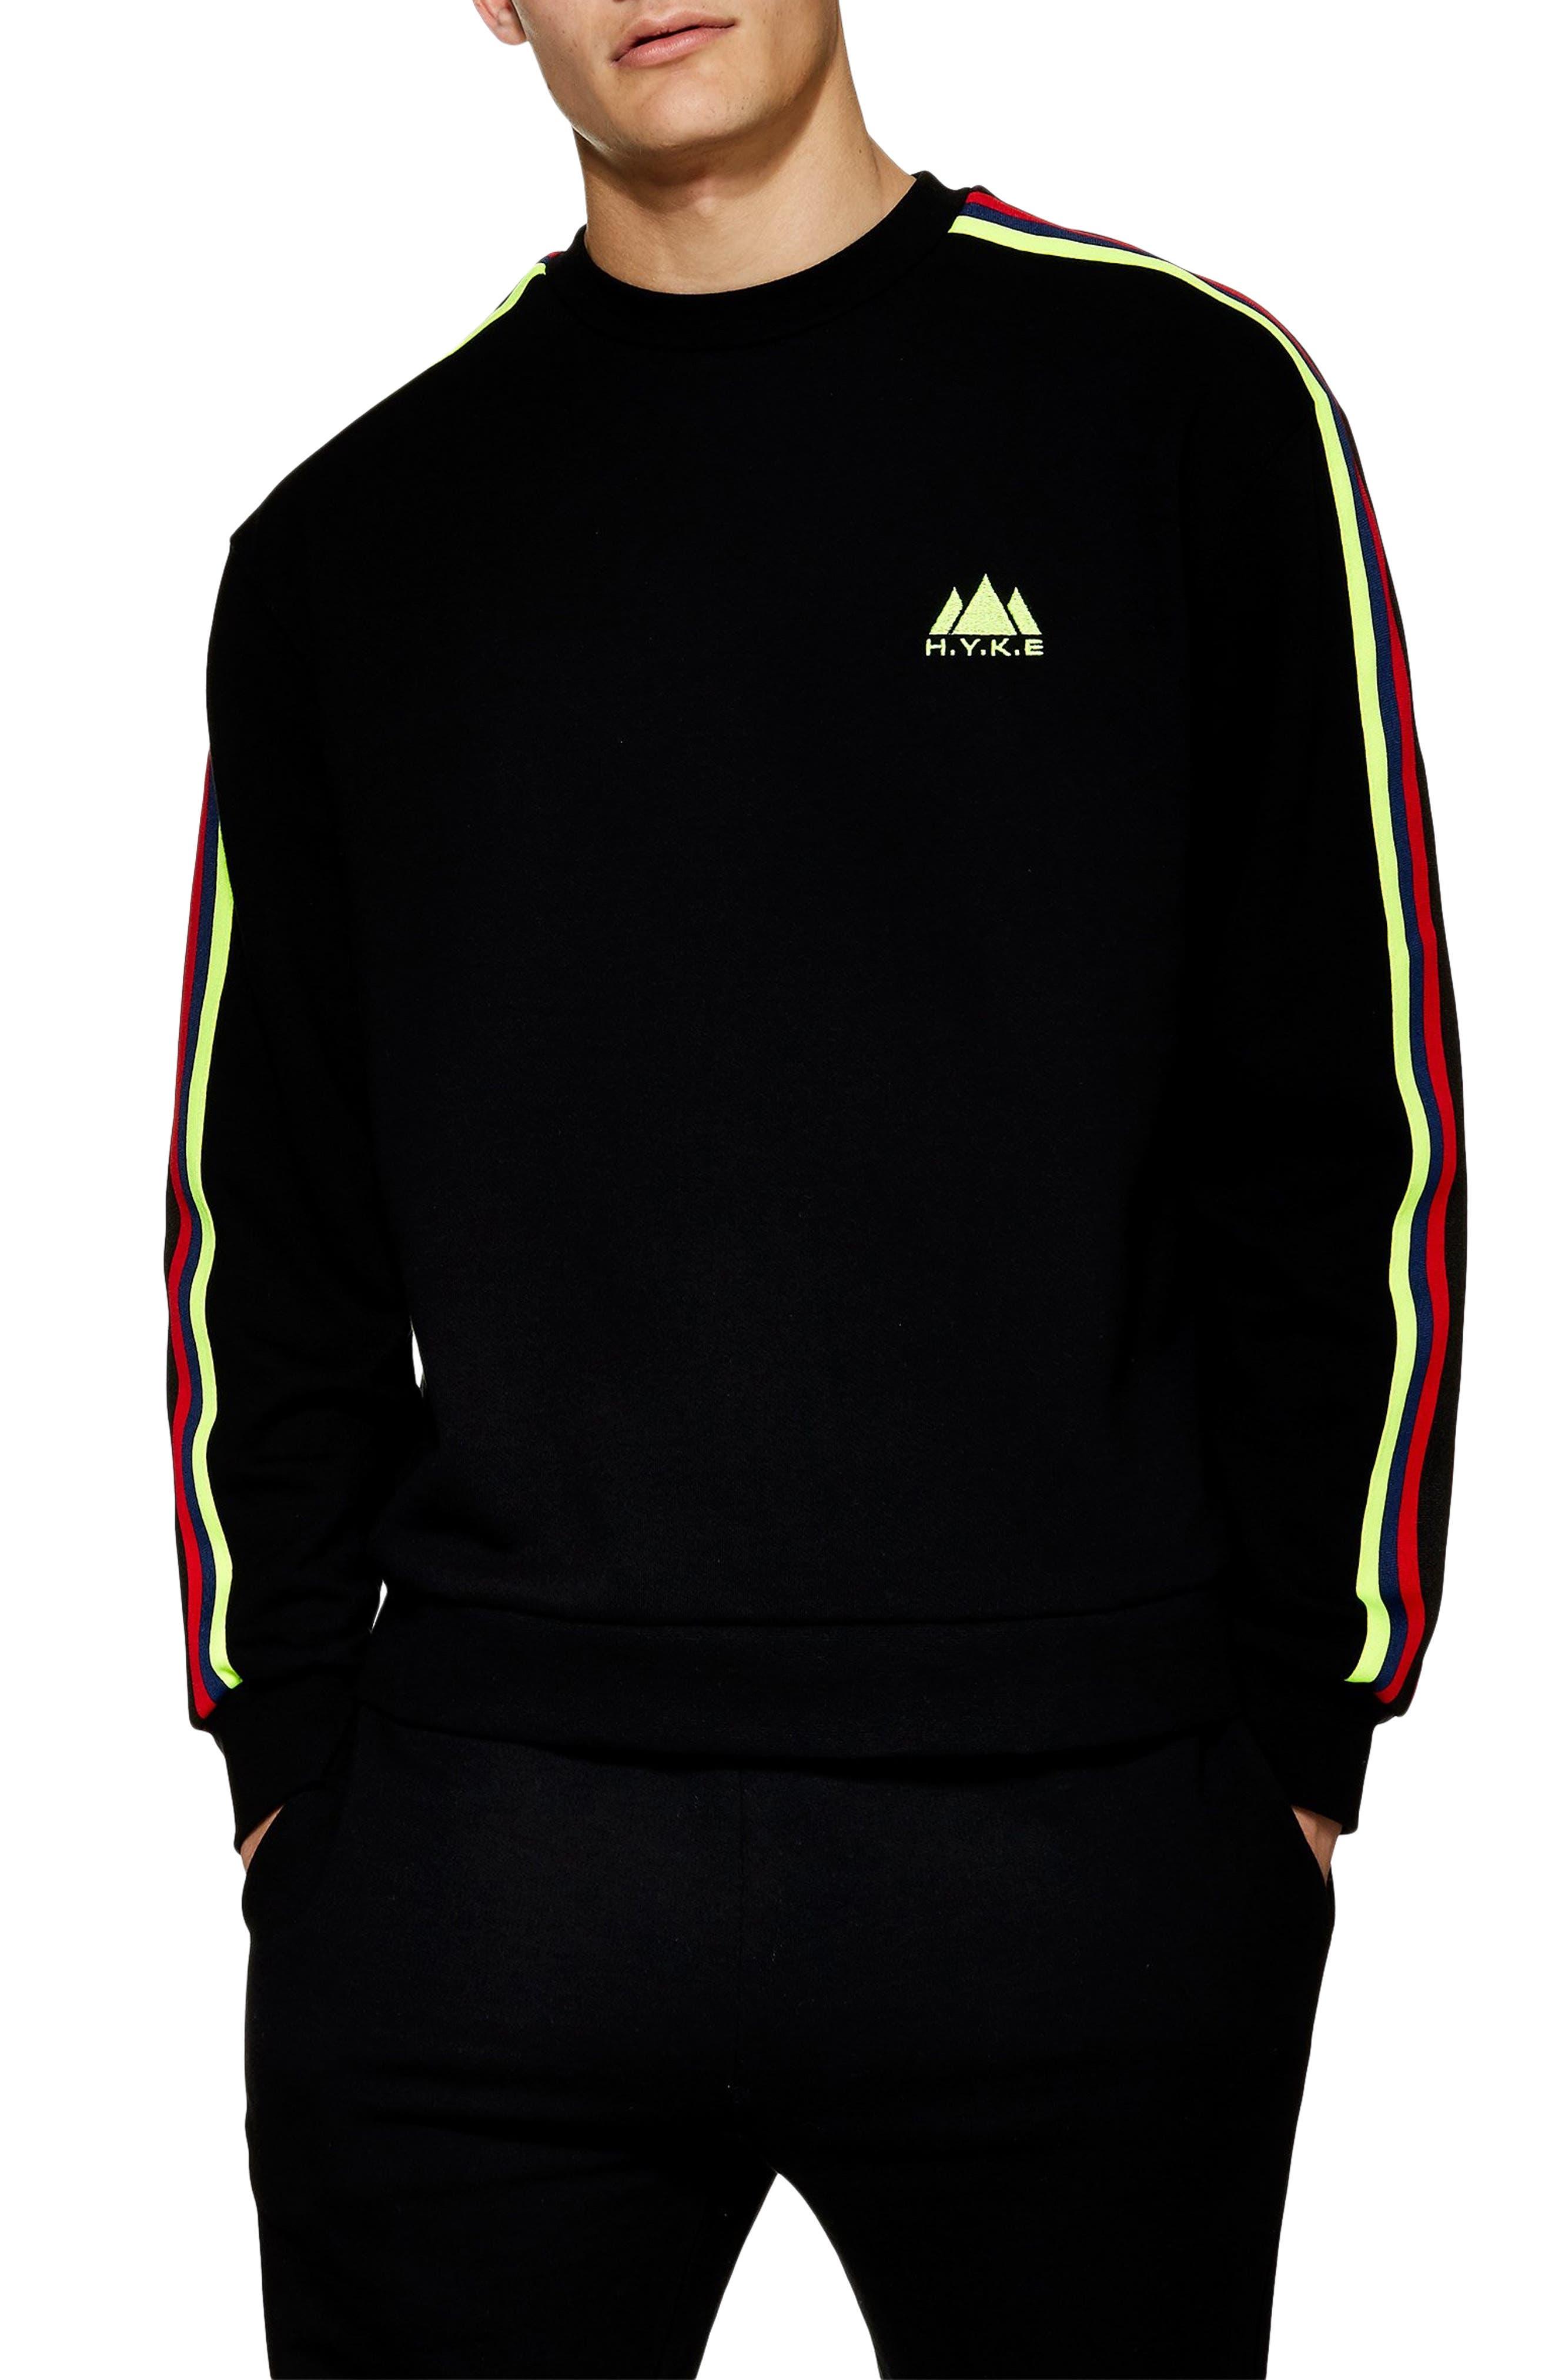 Topman H.y.k.e Tape Crewneck Sweatshirt, Black